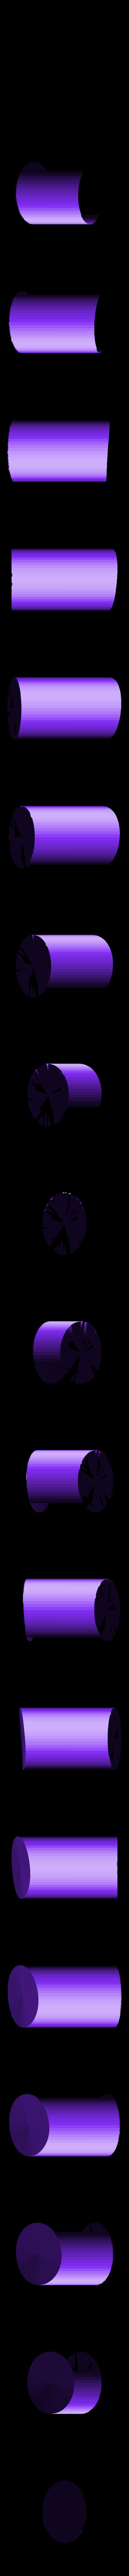 eye_pupil_black_left.stl Download free STL file Princess Peach from Mario games - multi-color • 3D print design, bpitanga